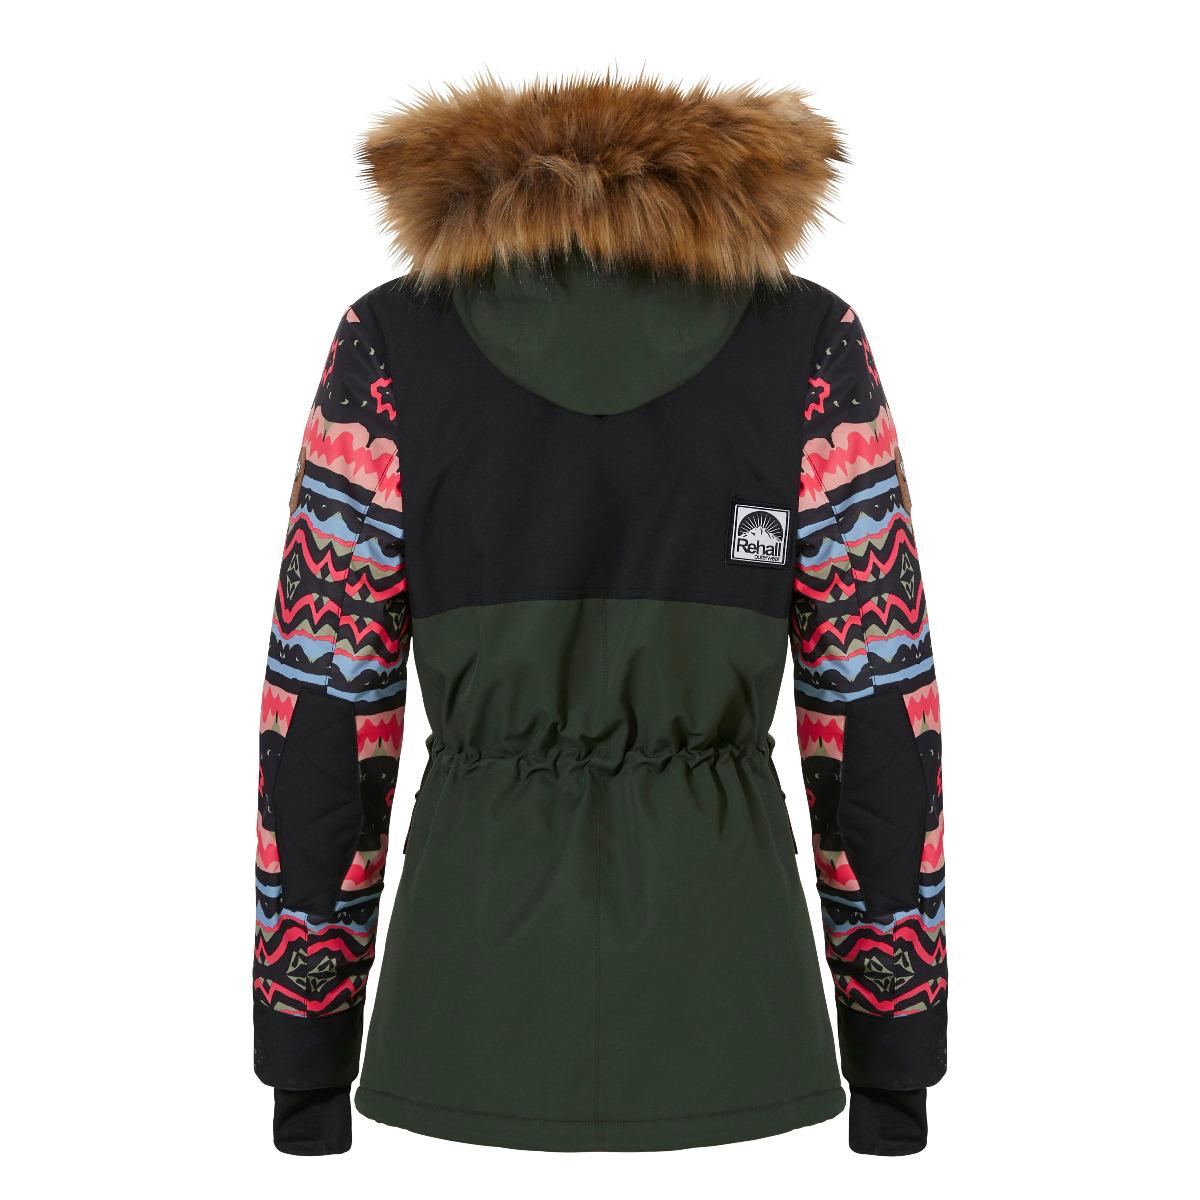 Rehall Mädchen Skijacke Ivey-R-JR 60103 indian sky